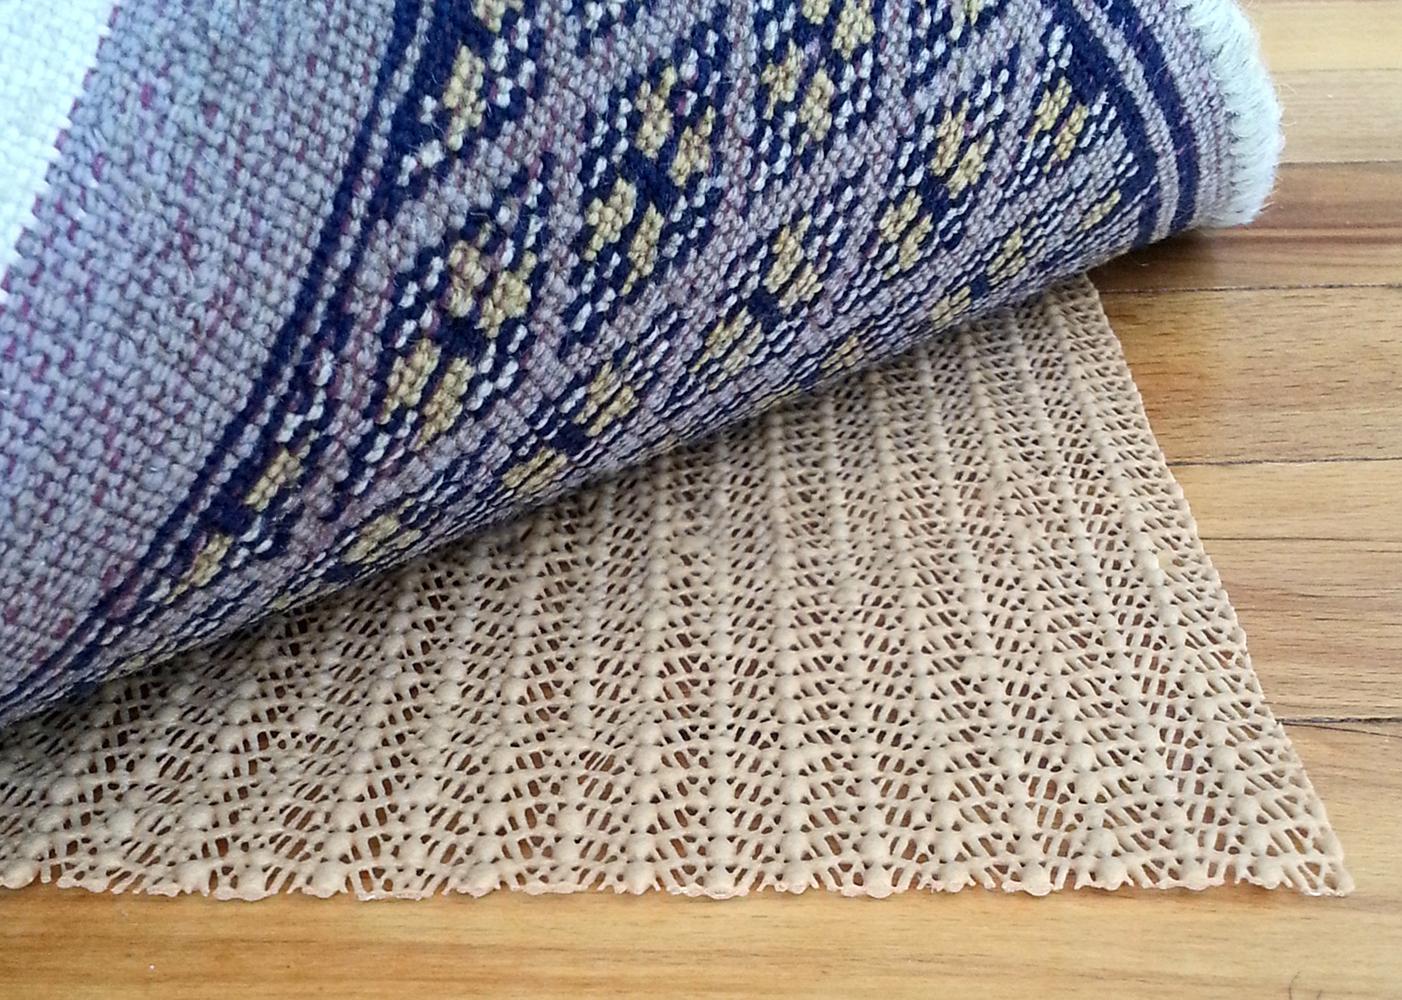 Non Skid Slip Area Rug Pad Underlay Nonskid Pads Carpet Mat Runner